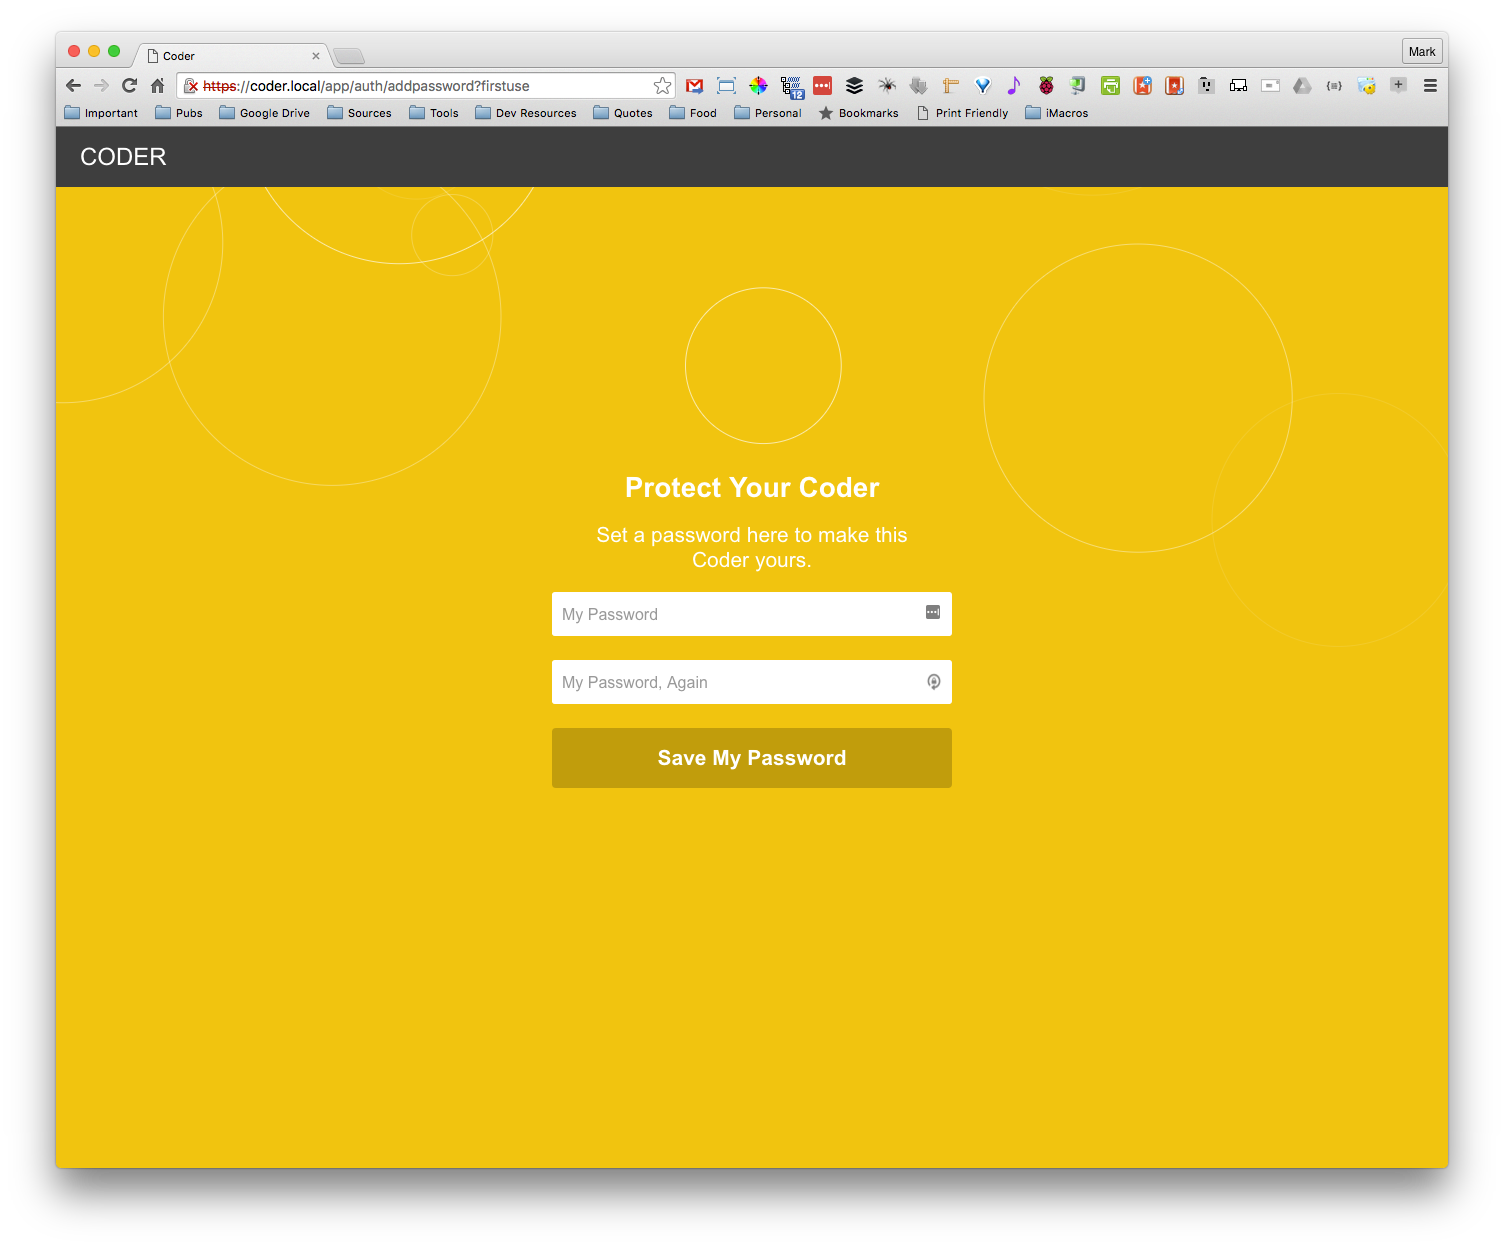 Raspberry Pi Google Coder Html Css Js Nodejs Way Cool Tools And Solutions Best Free Onli Element14 Community 0 3